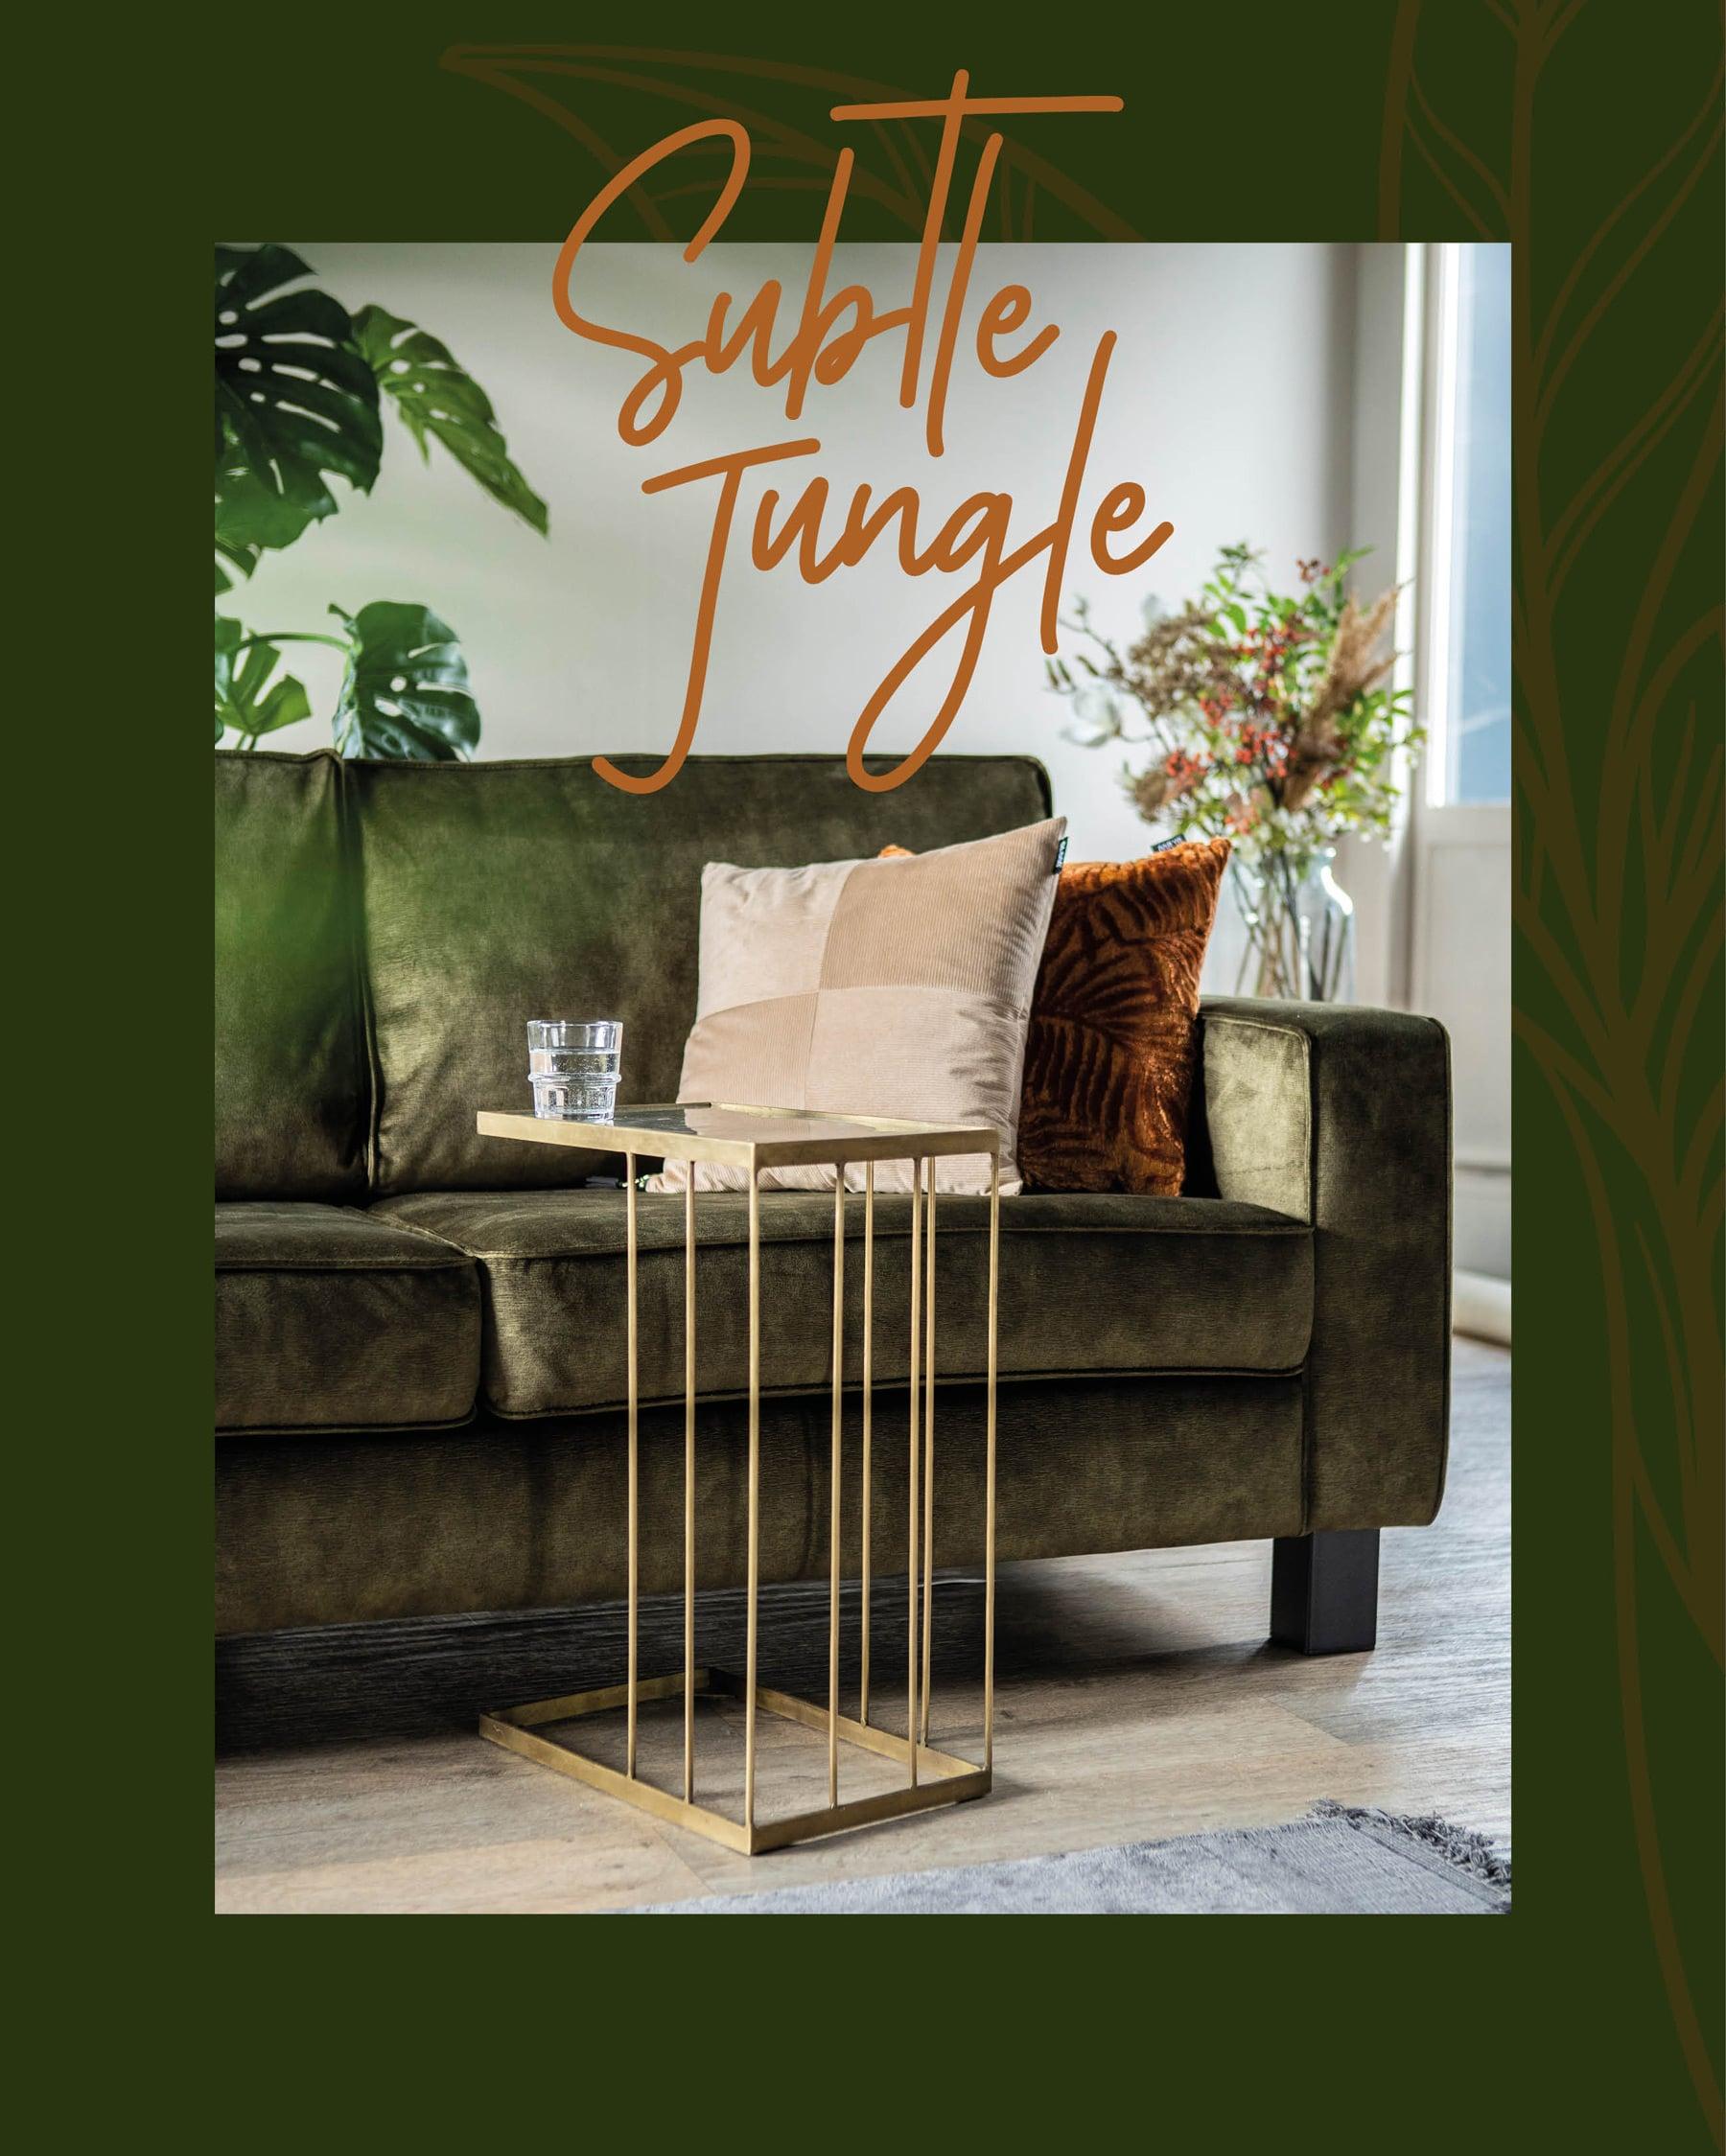 Subtle jungle